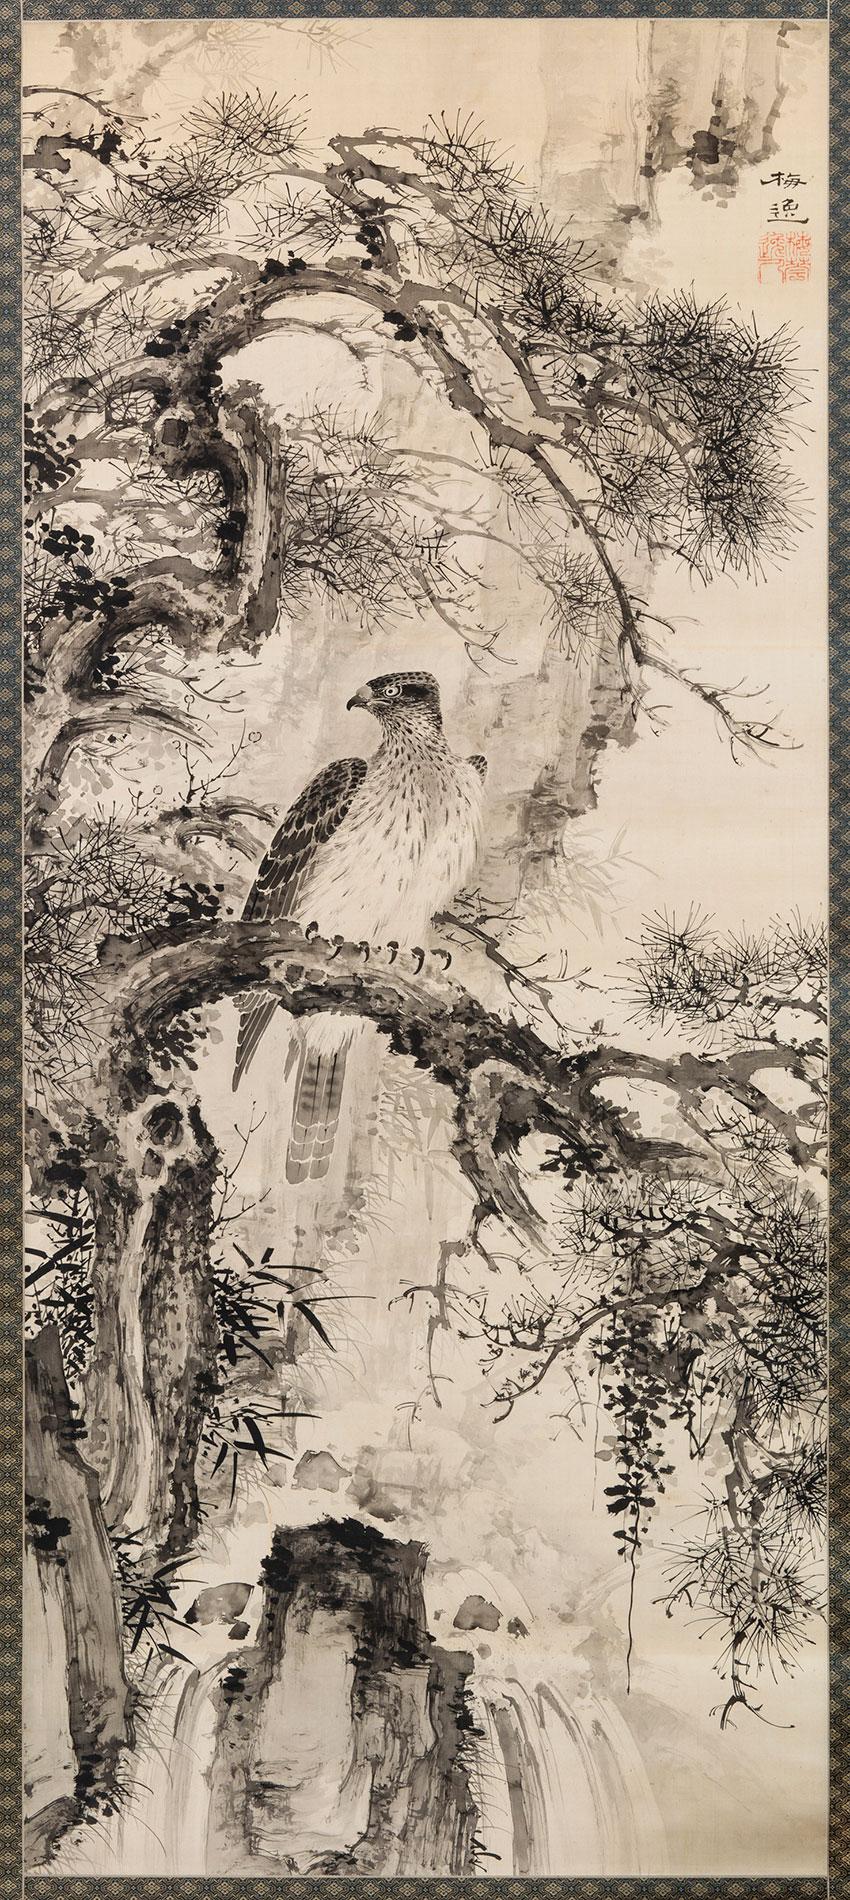 Yamamoto Baiitsu, Japan-1783 - 1856- Deep valley- old pine- c.1840s- Kyoto or Nagoya- ink on silk